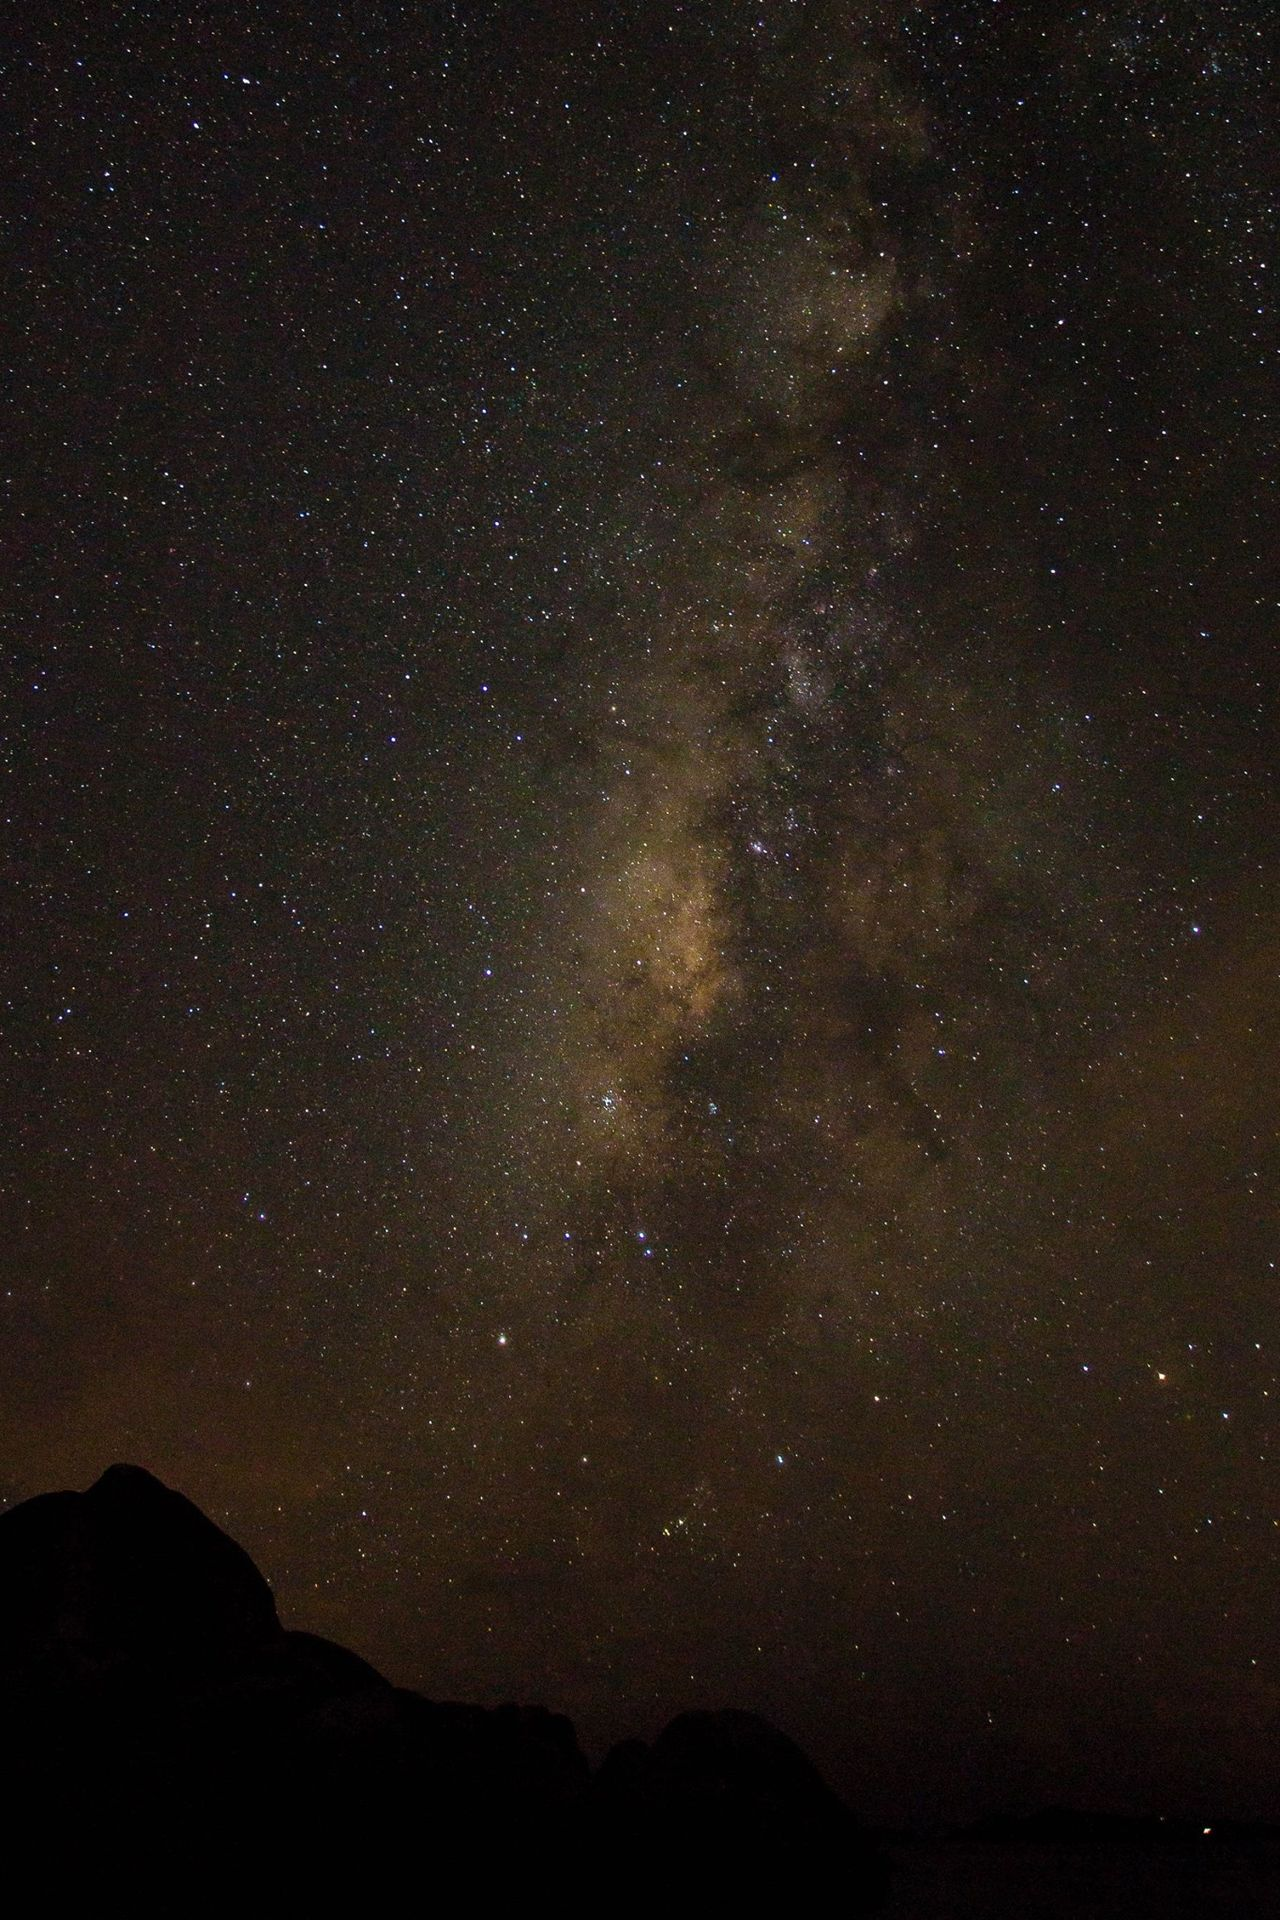 Shoot for the stars... Caribbean Bvi The Baths Virgin Gorda Rocks Stars Milkyway Milky Way Astrophotography Astronomy